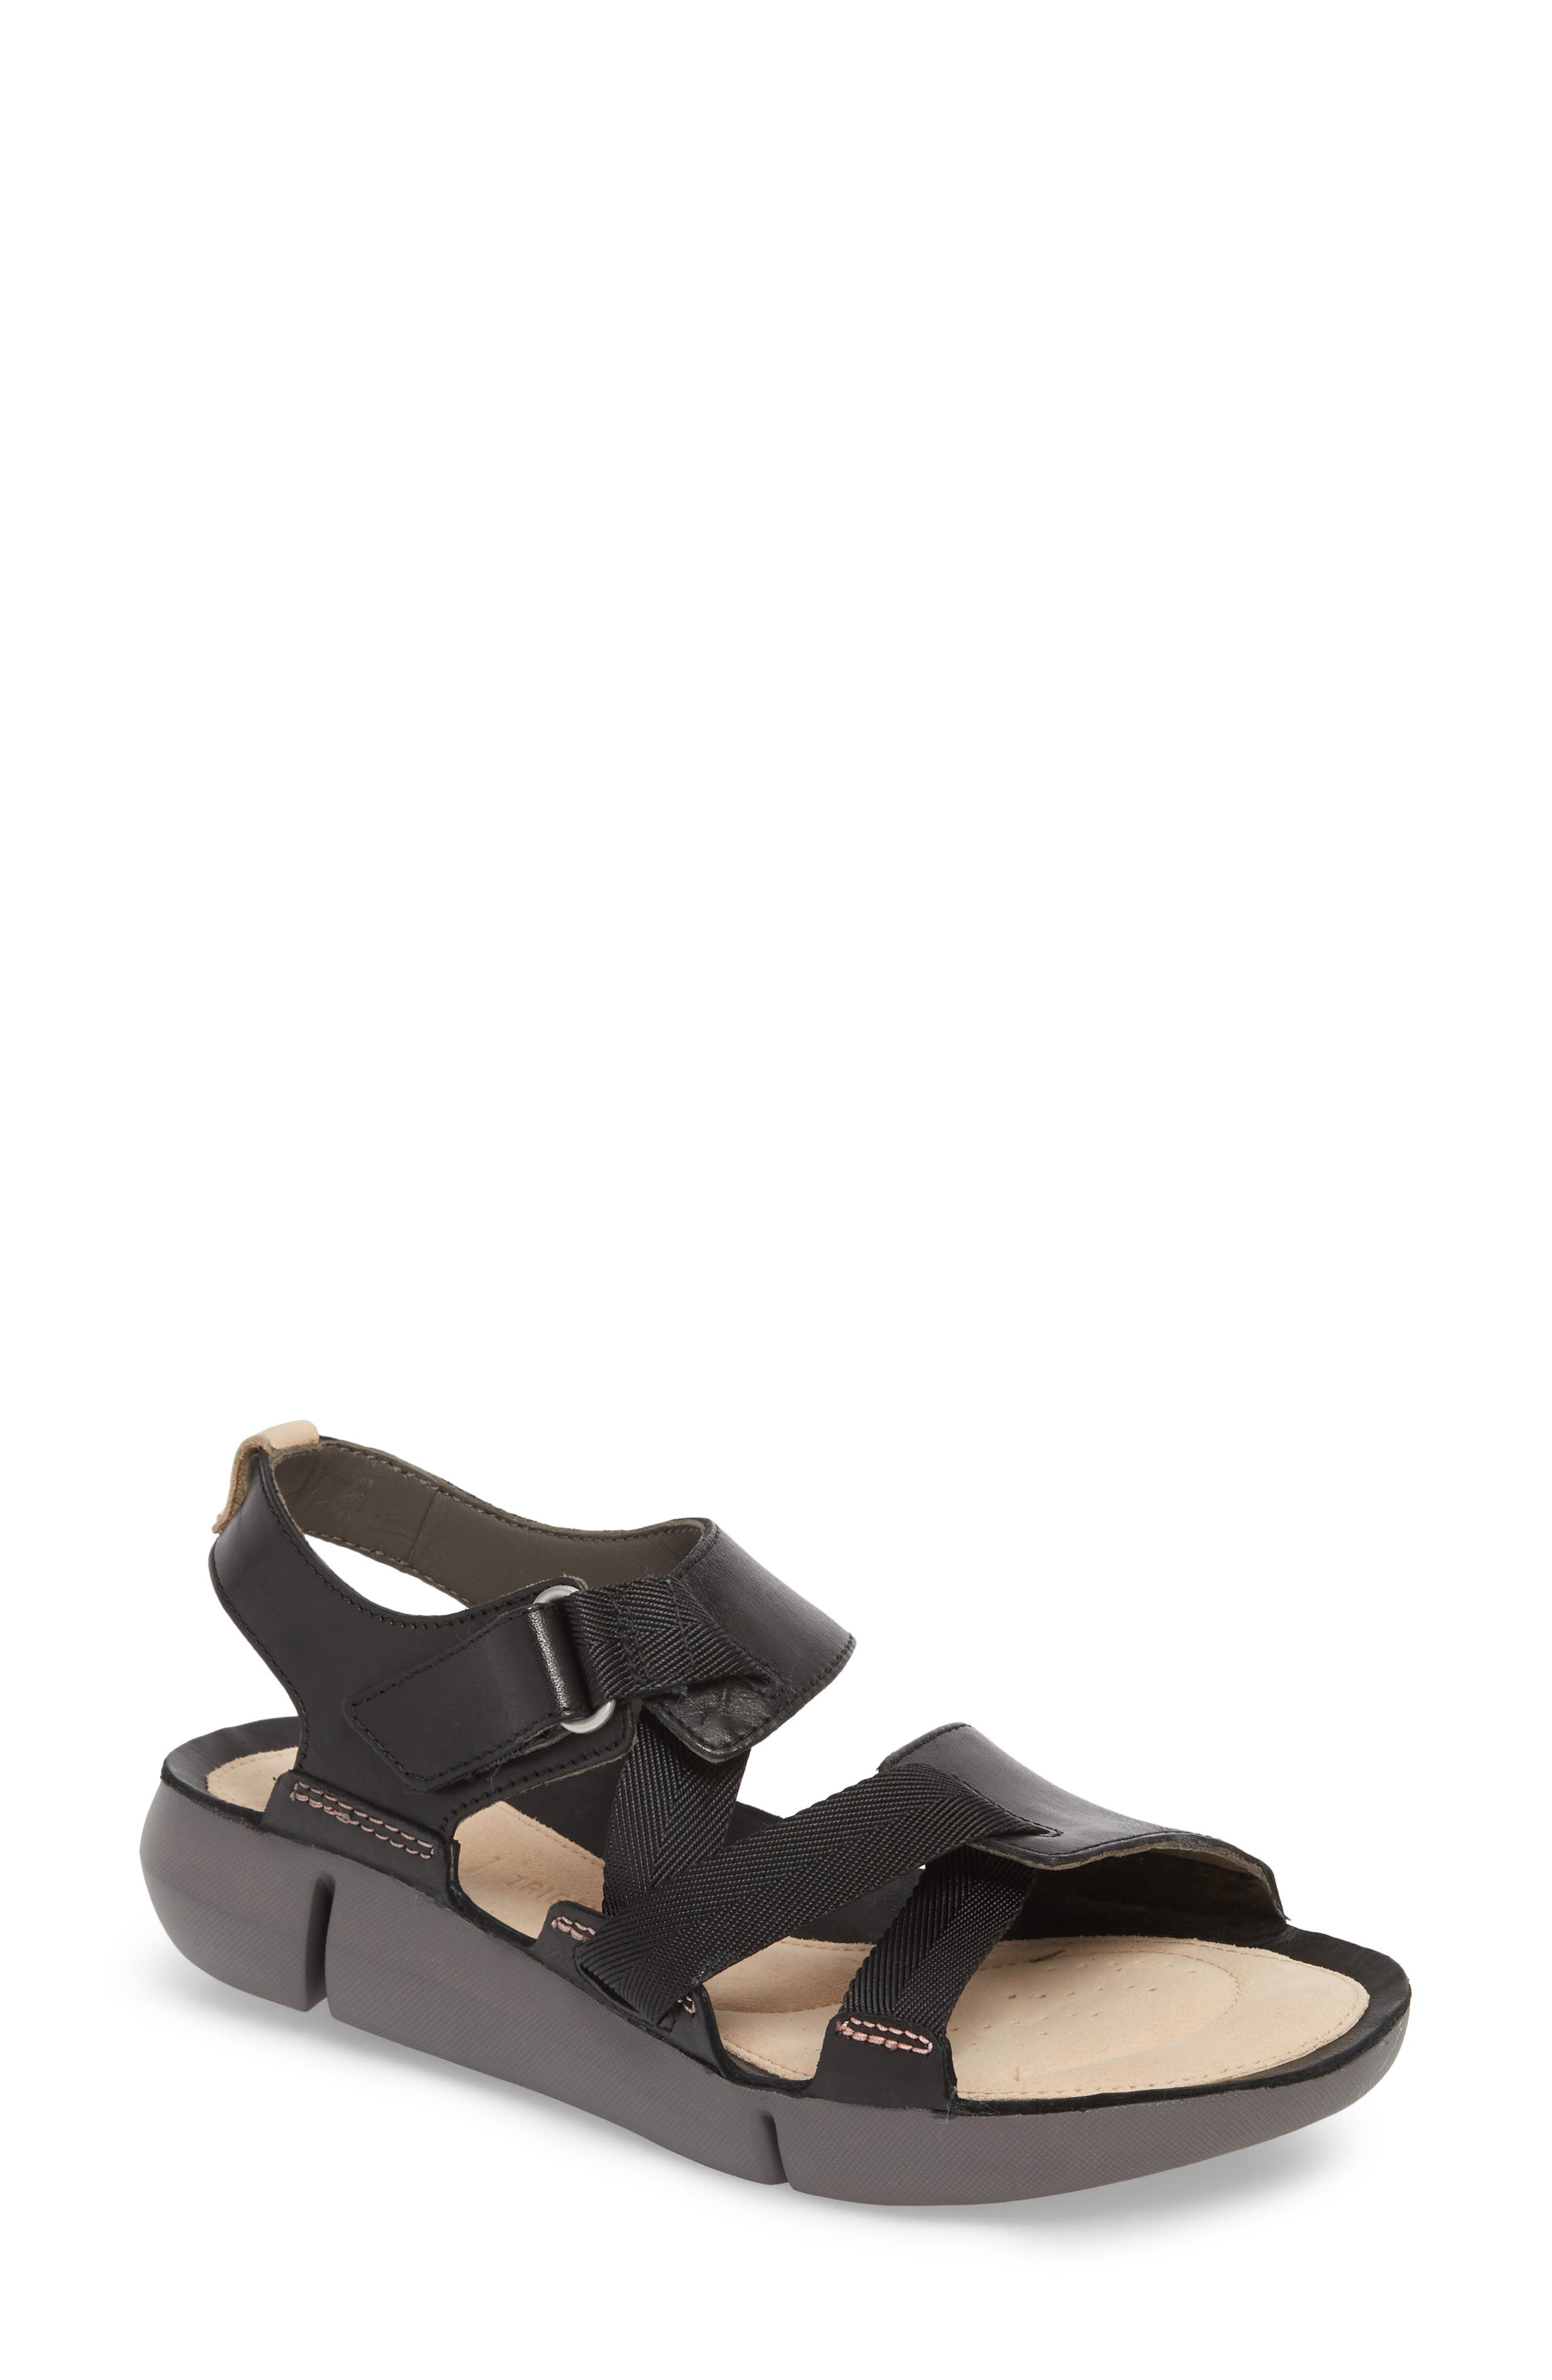 Tri Clover Sandal,                         Main,                         color, Black Leather